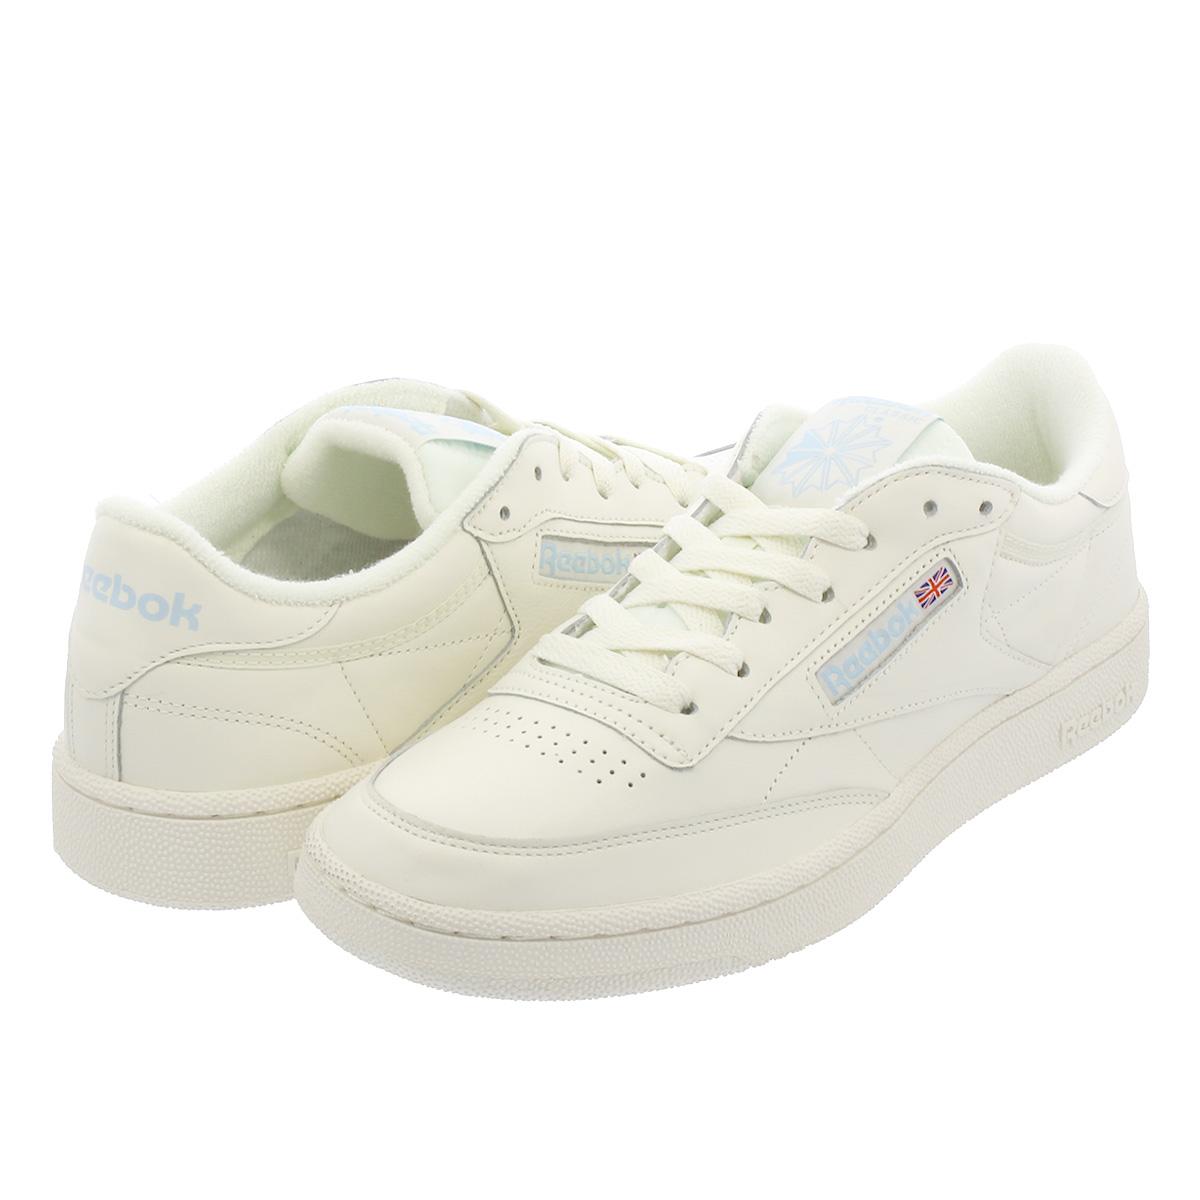 Reebok Classic Club C 85 Vintage Shoes Beige White V69406 SZ 5 12.5 | eBay